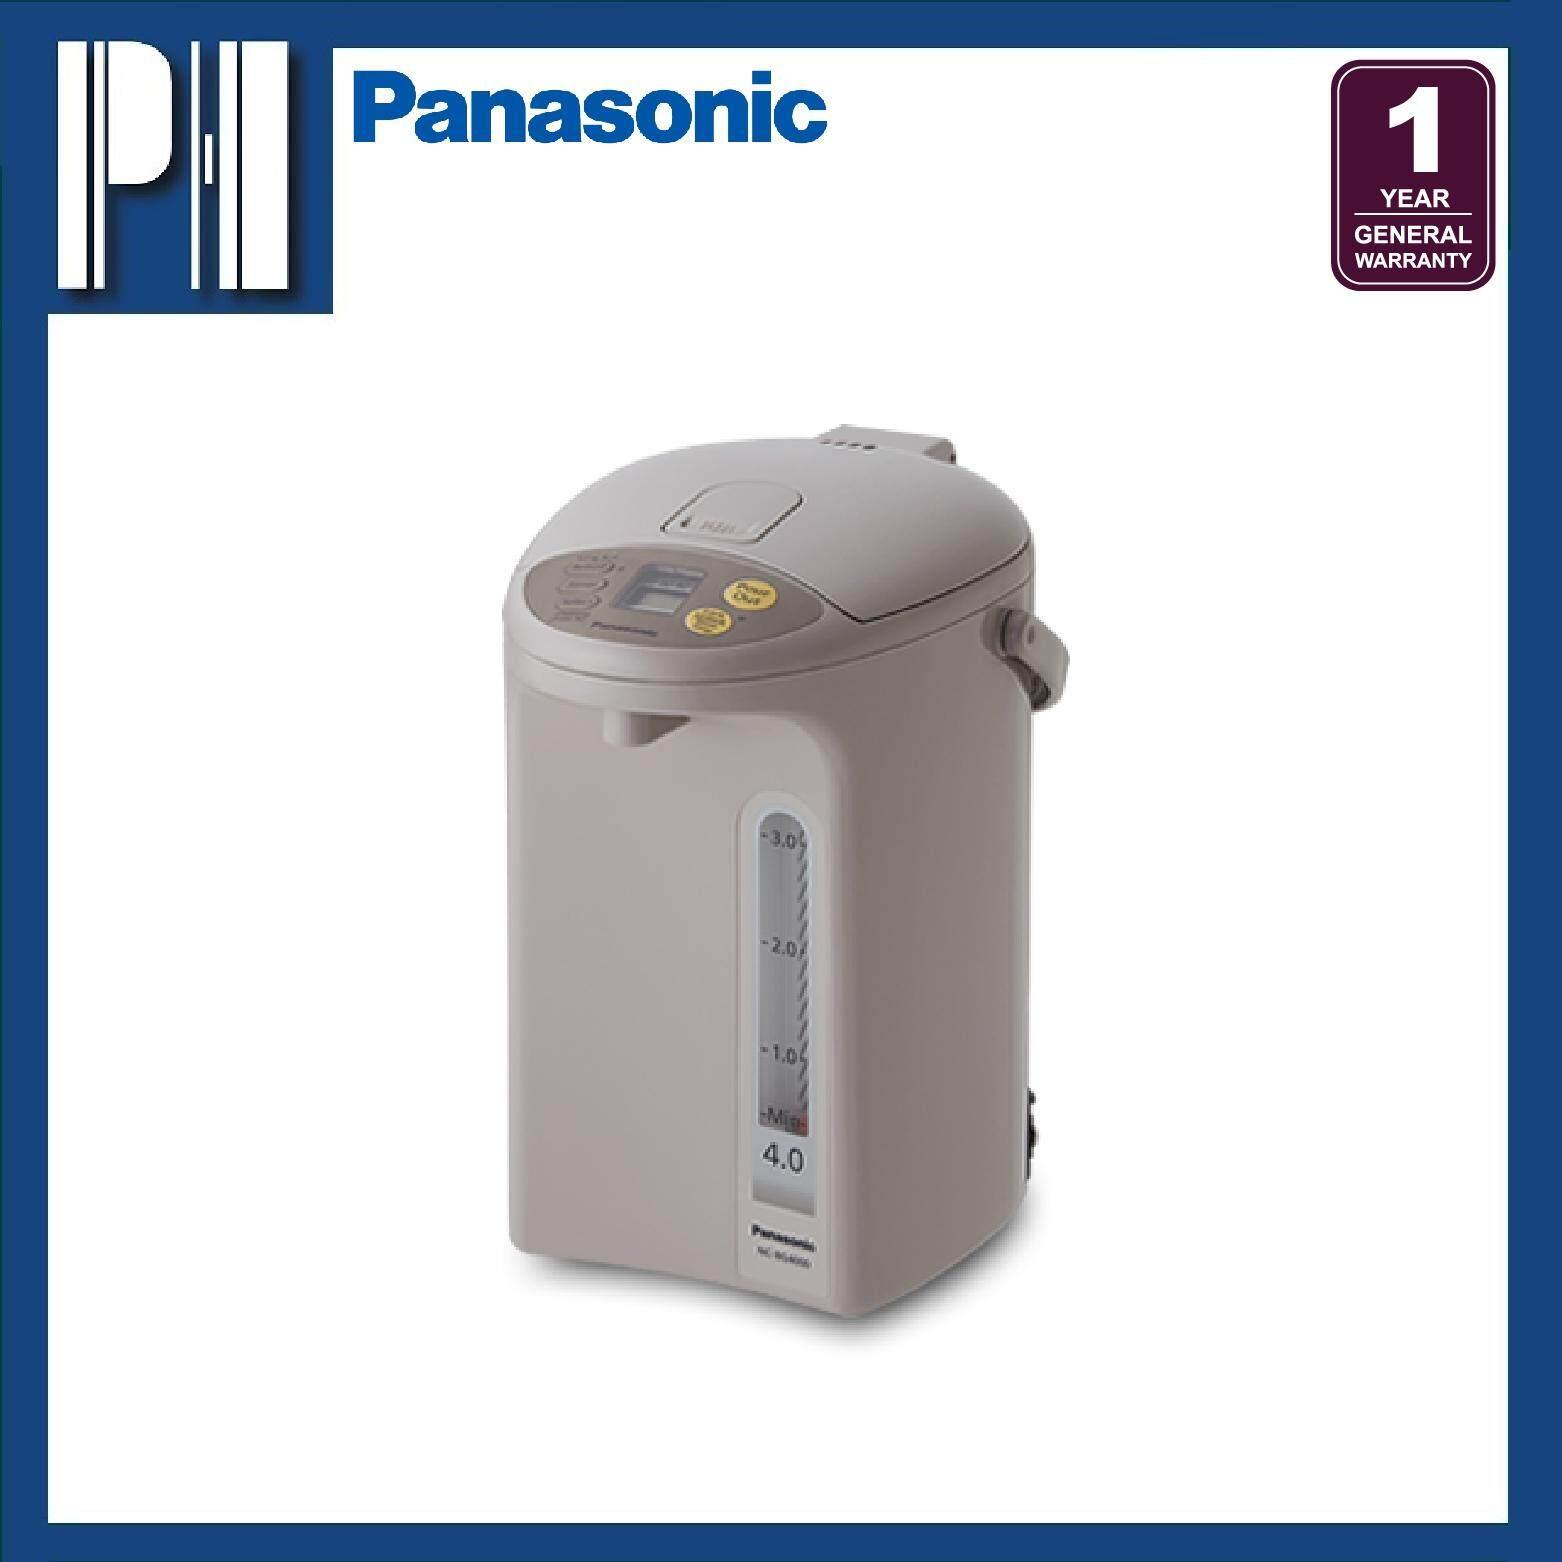 PANASONIC NC-BG4000CSK 4.0L THERMO POT